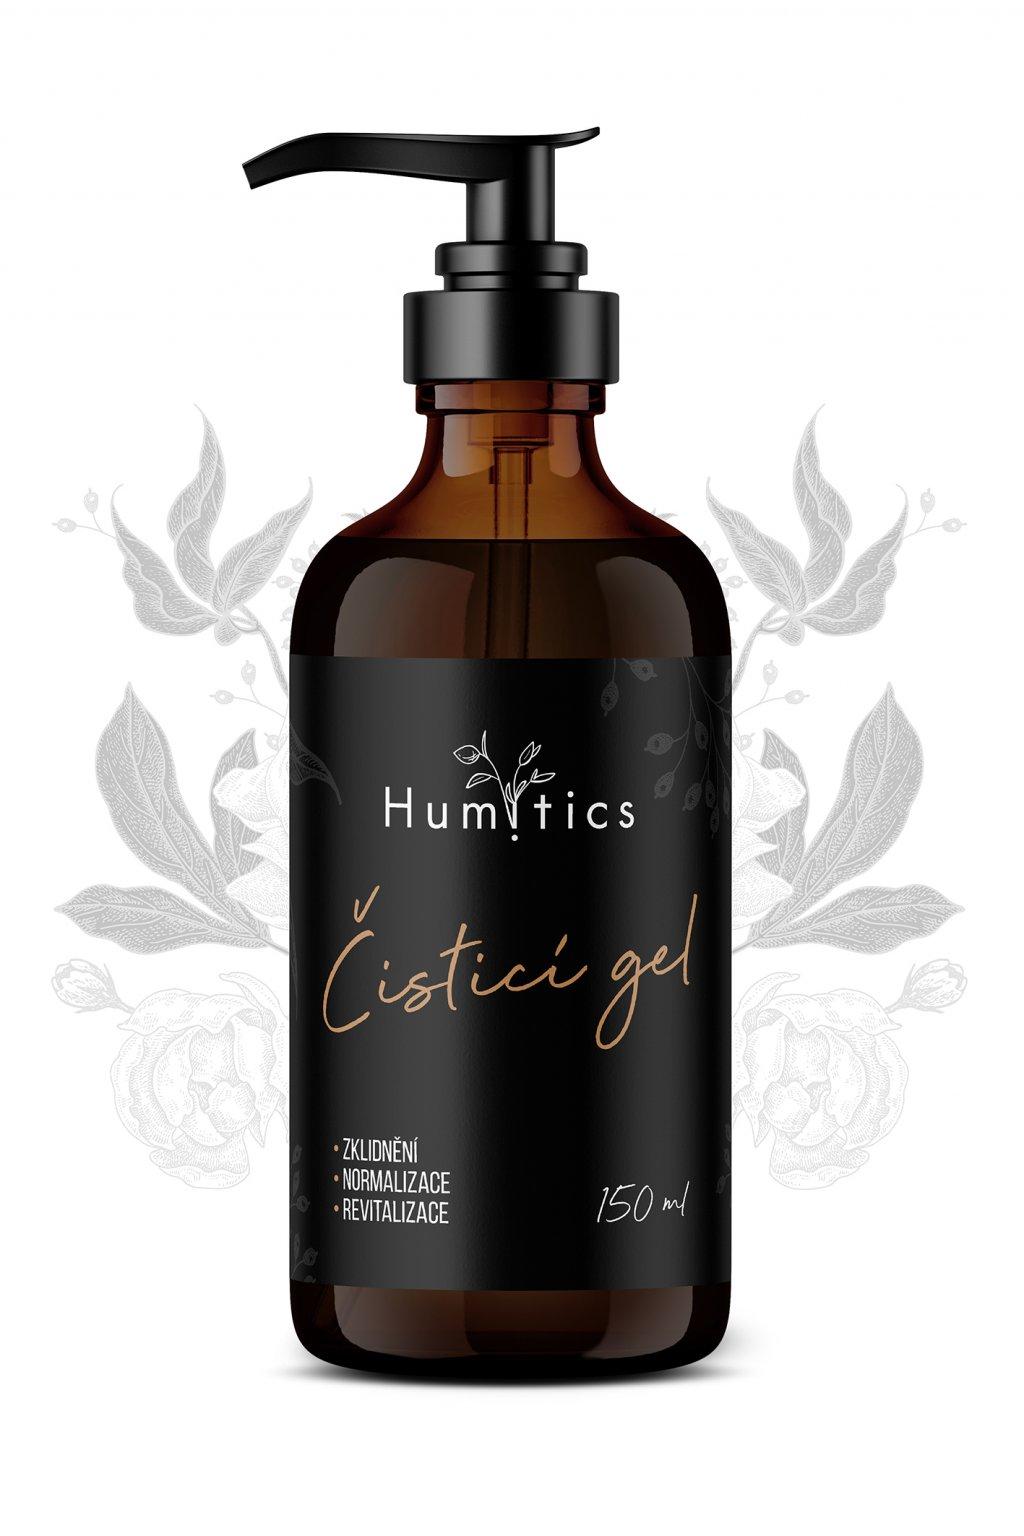 Humitics Cistici gel 150ml 72dpi V2 motiv